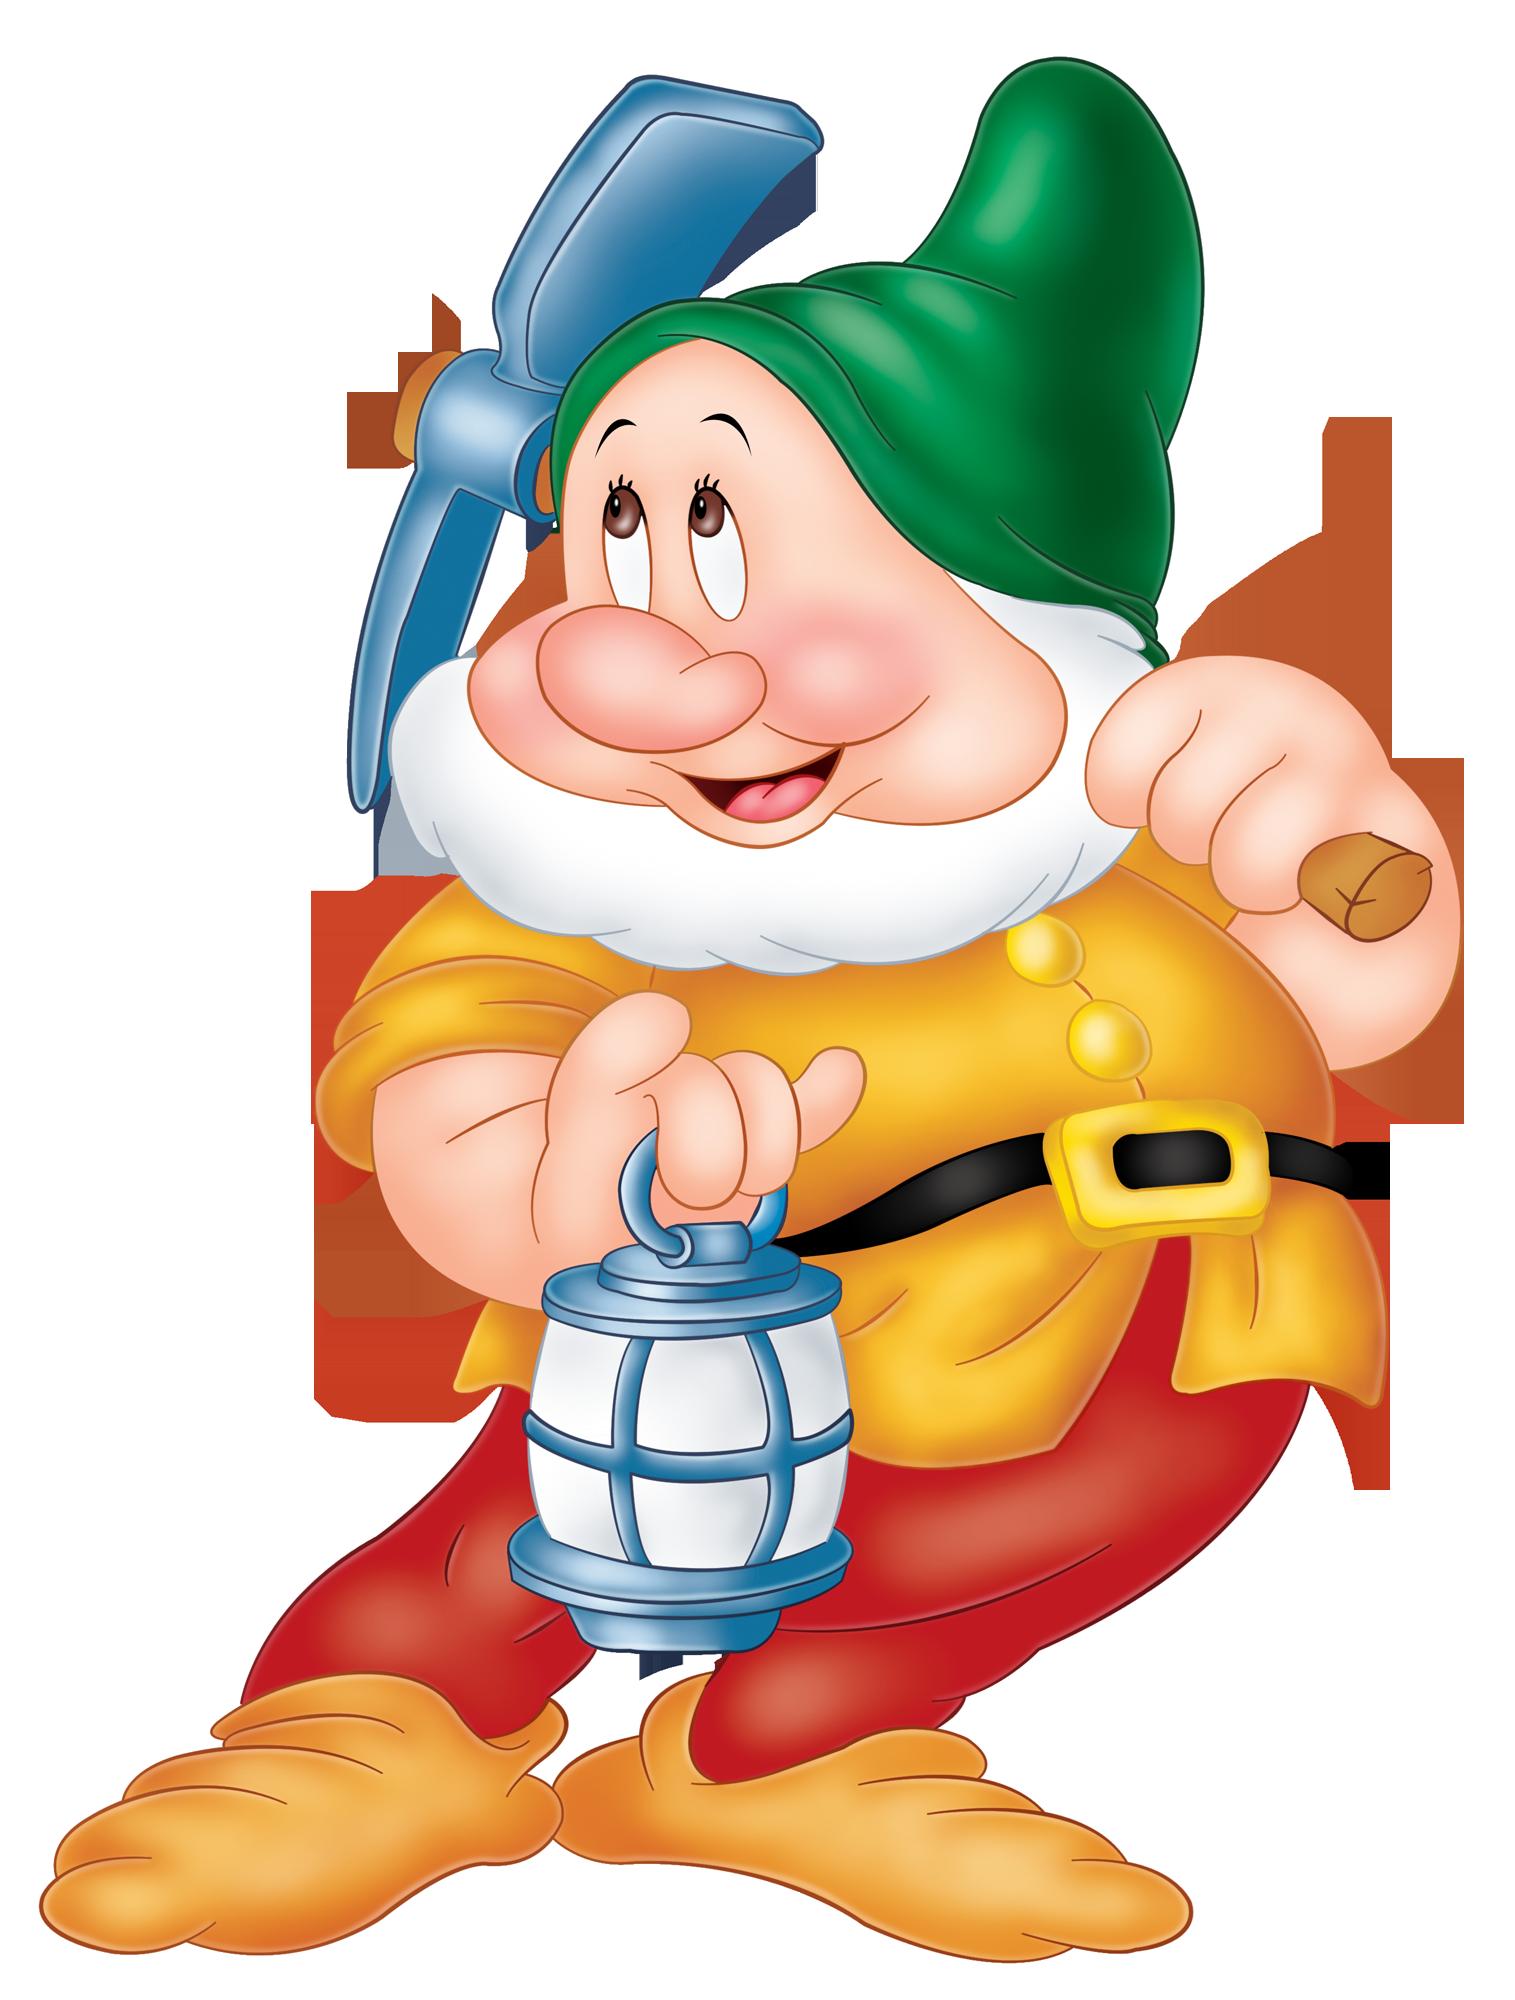 Sneezy Snow White Dwarf PNG Image.